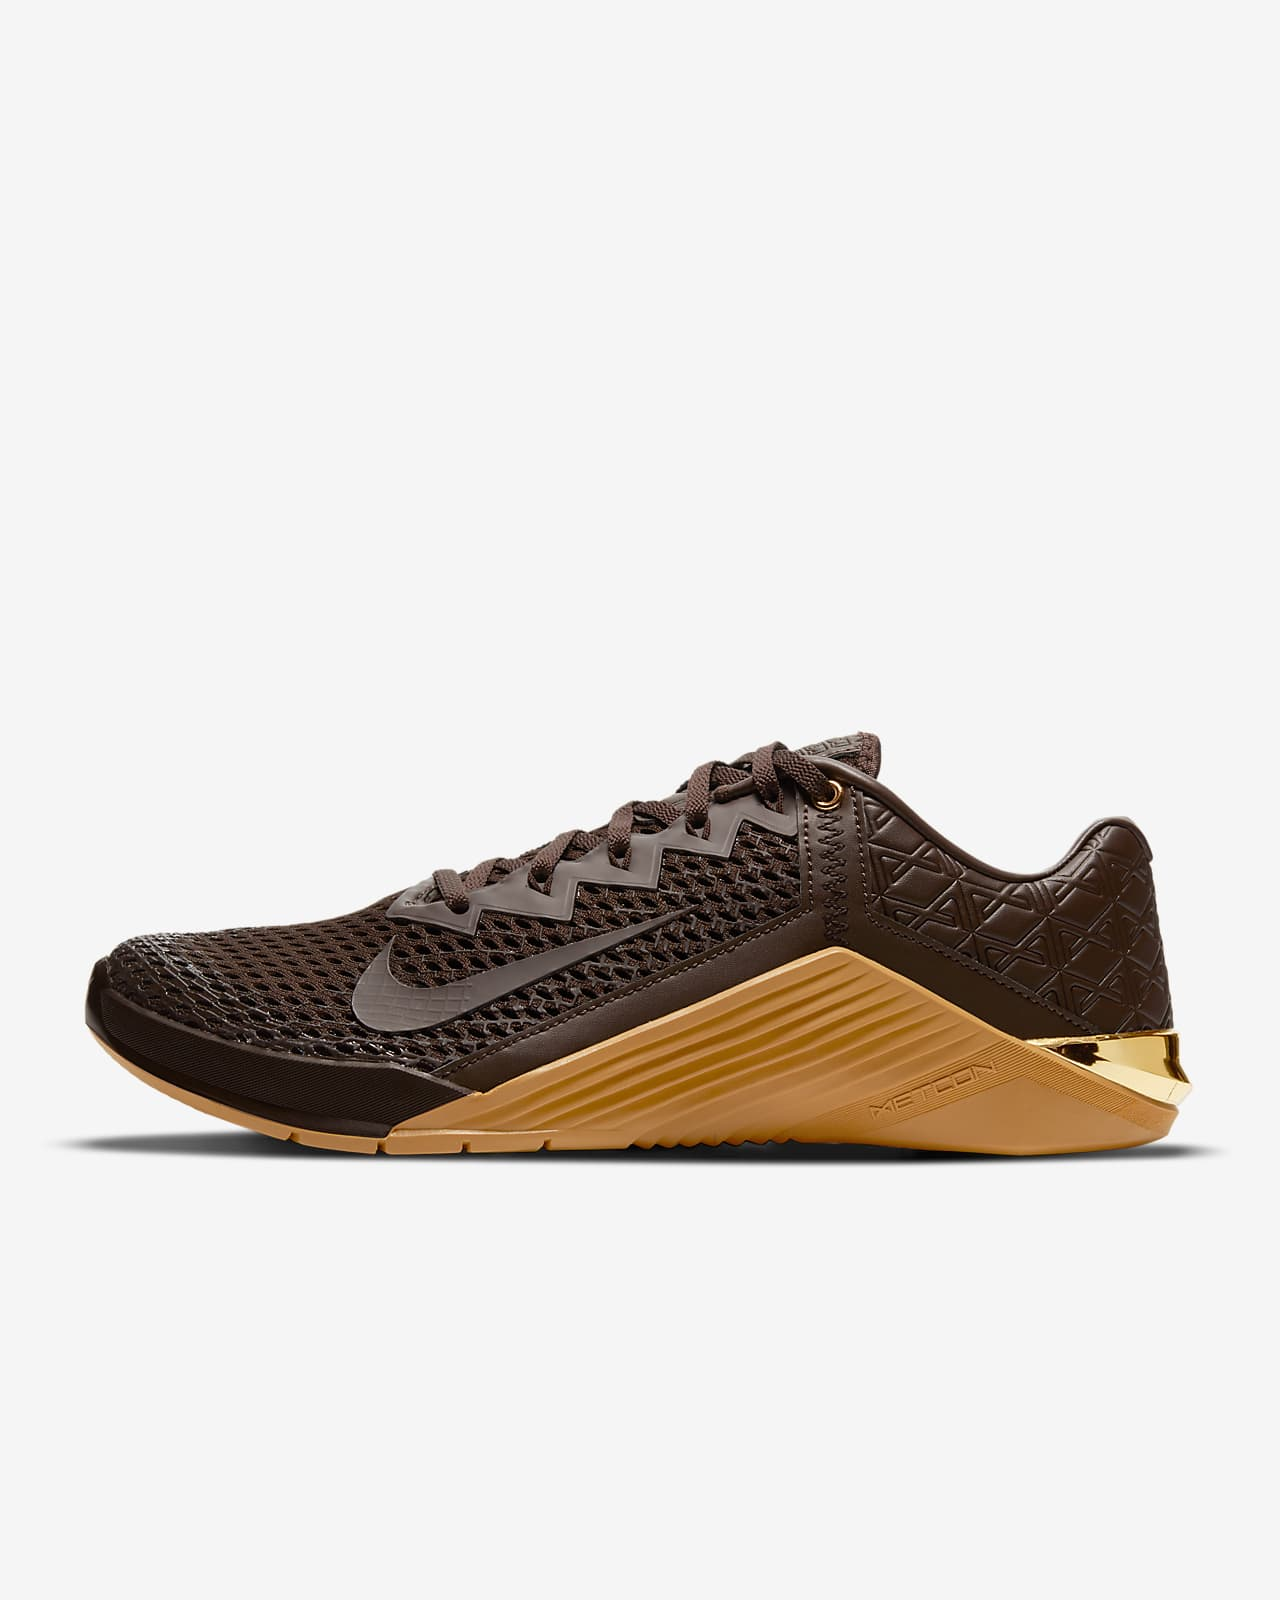 Nike Metcon 6 Premium Training Shoe